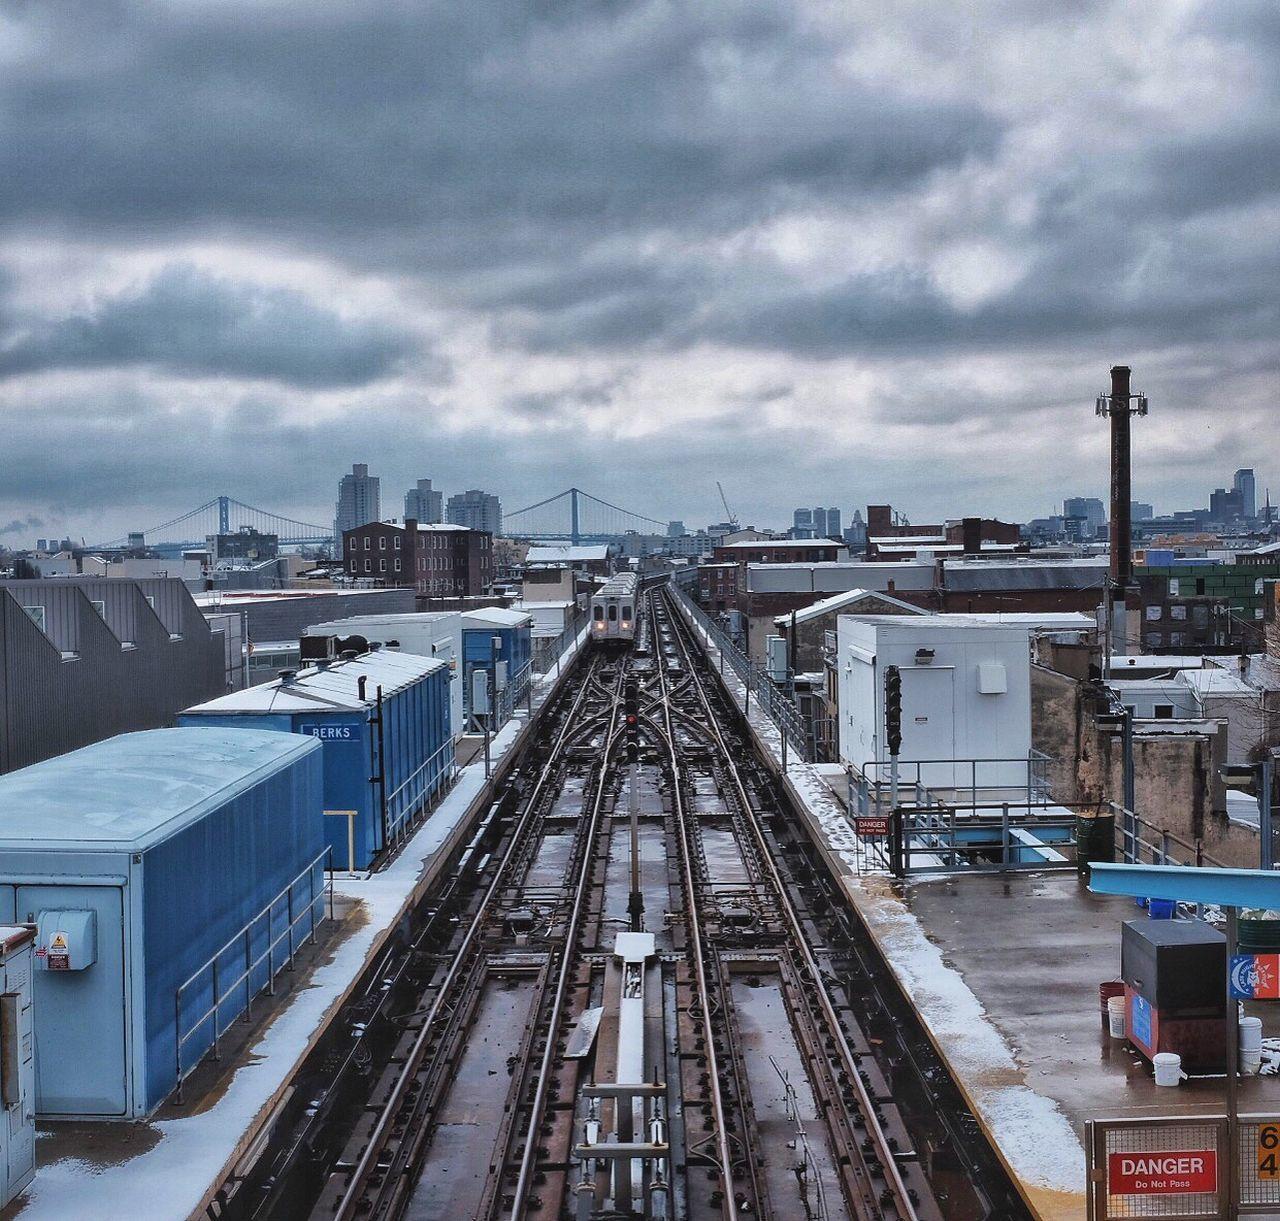 Market-Frankford Line • Phialdelphia, PA • 2016 Philadelphia Philly Market-frankford Line Train Train Station Train Tracks Trainphotography EyeEm EyeEm Gallery EyeEm Best Shots EyeEmBestPics Phillyphotographer Phillyprimeshots